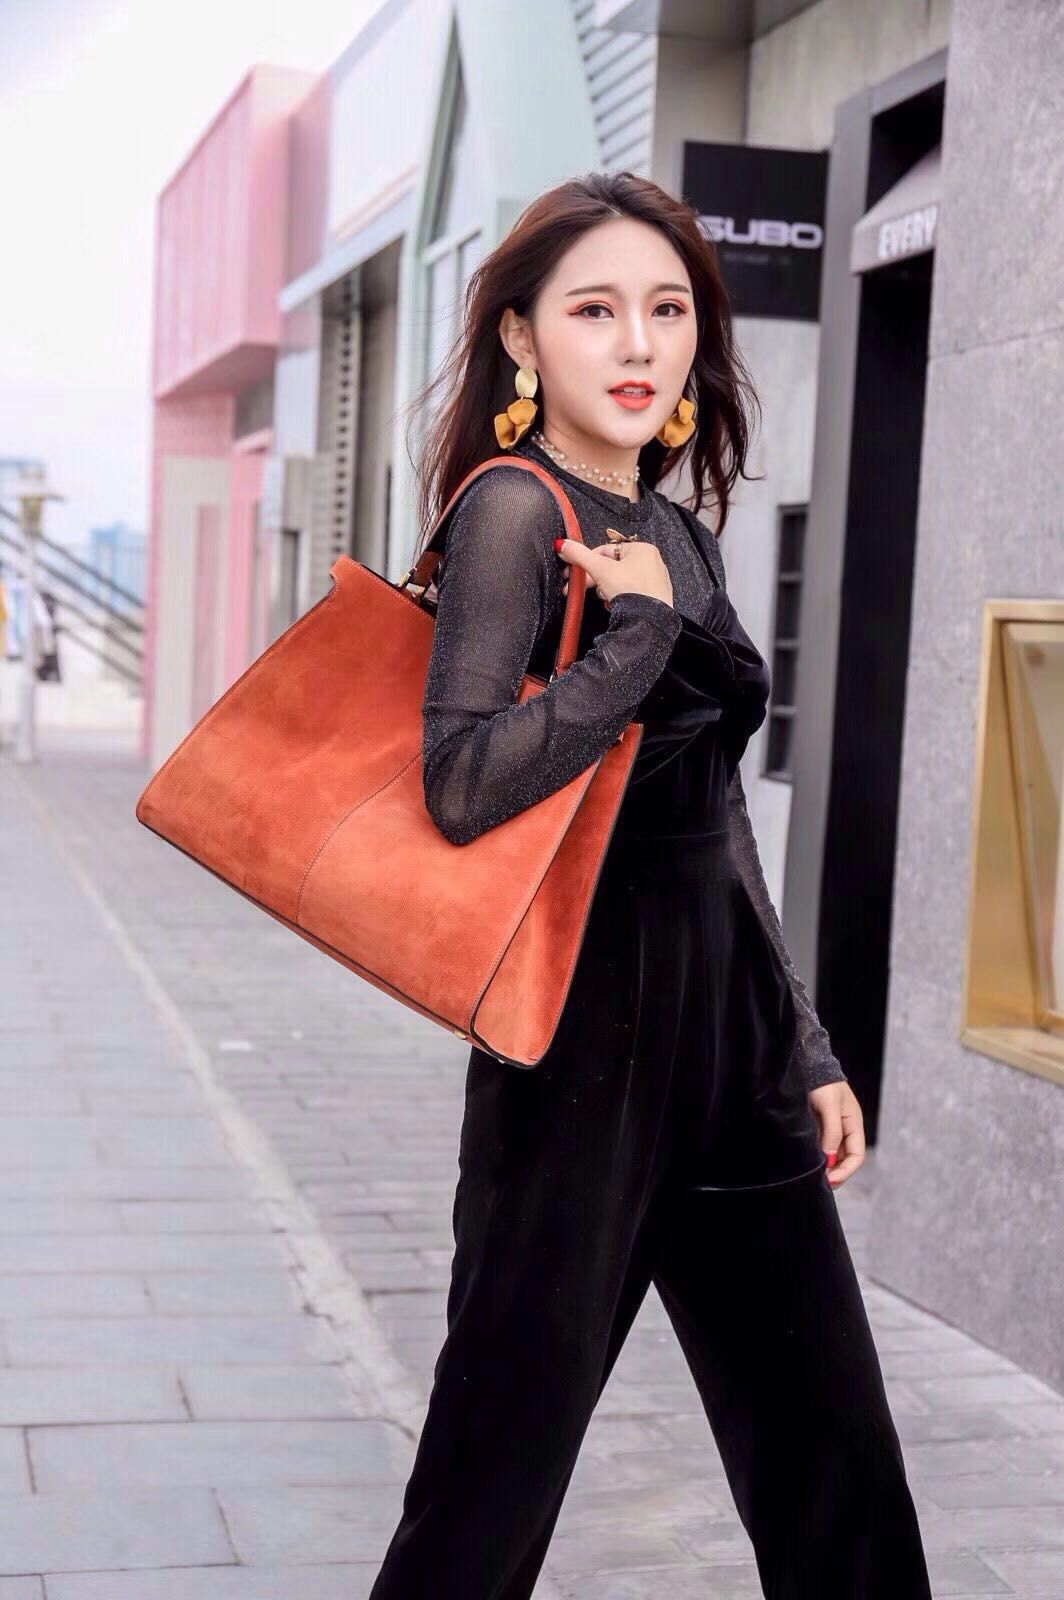 a335c8593f5 Fendi Peekaboo X-Lite Bag orange | Fendi purse and bags in 2019 ...